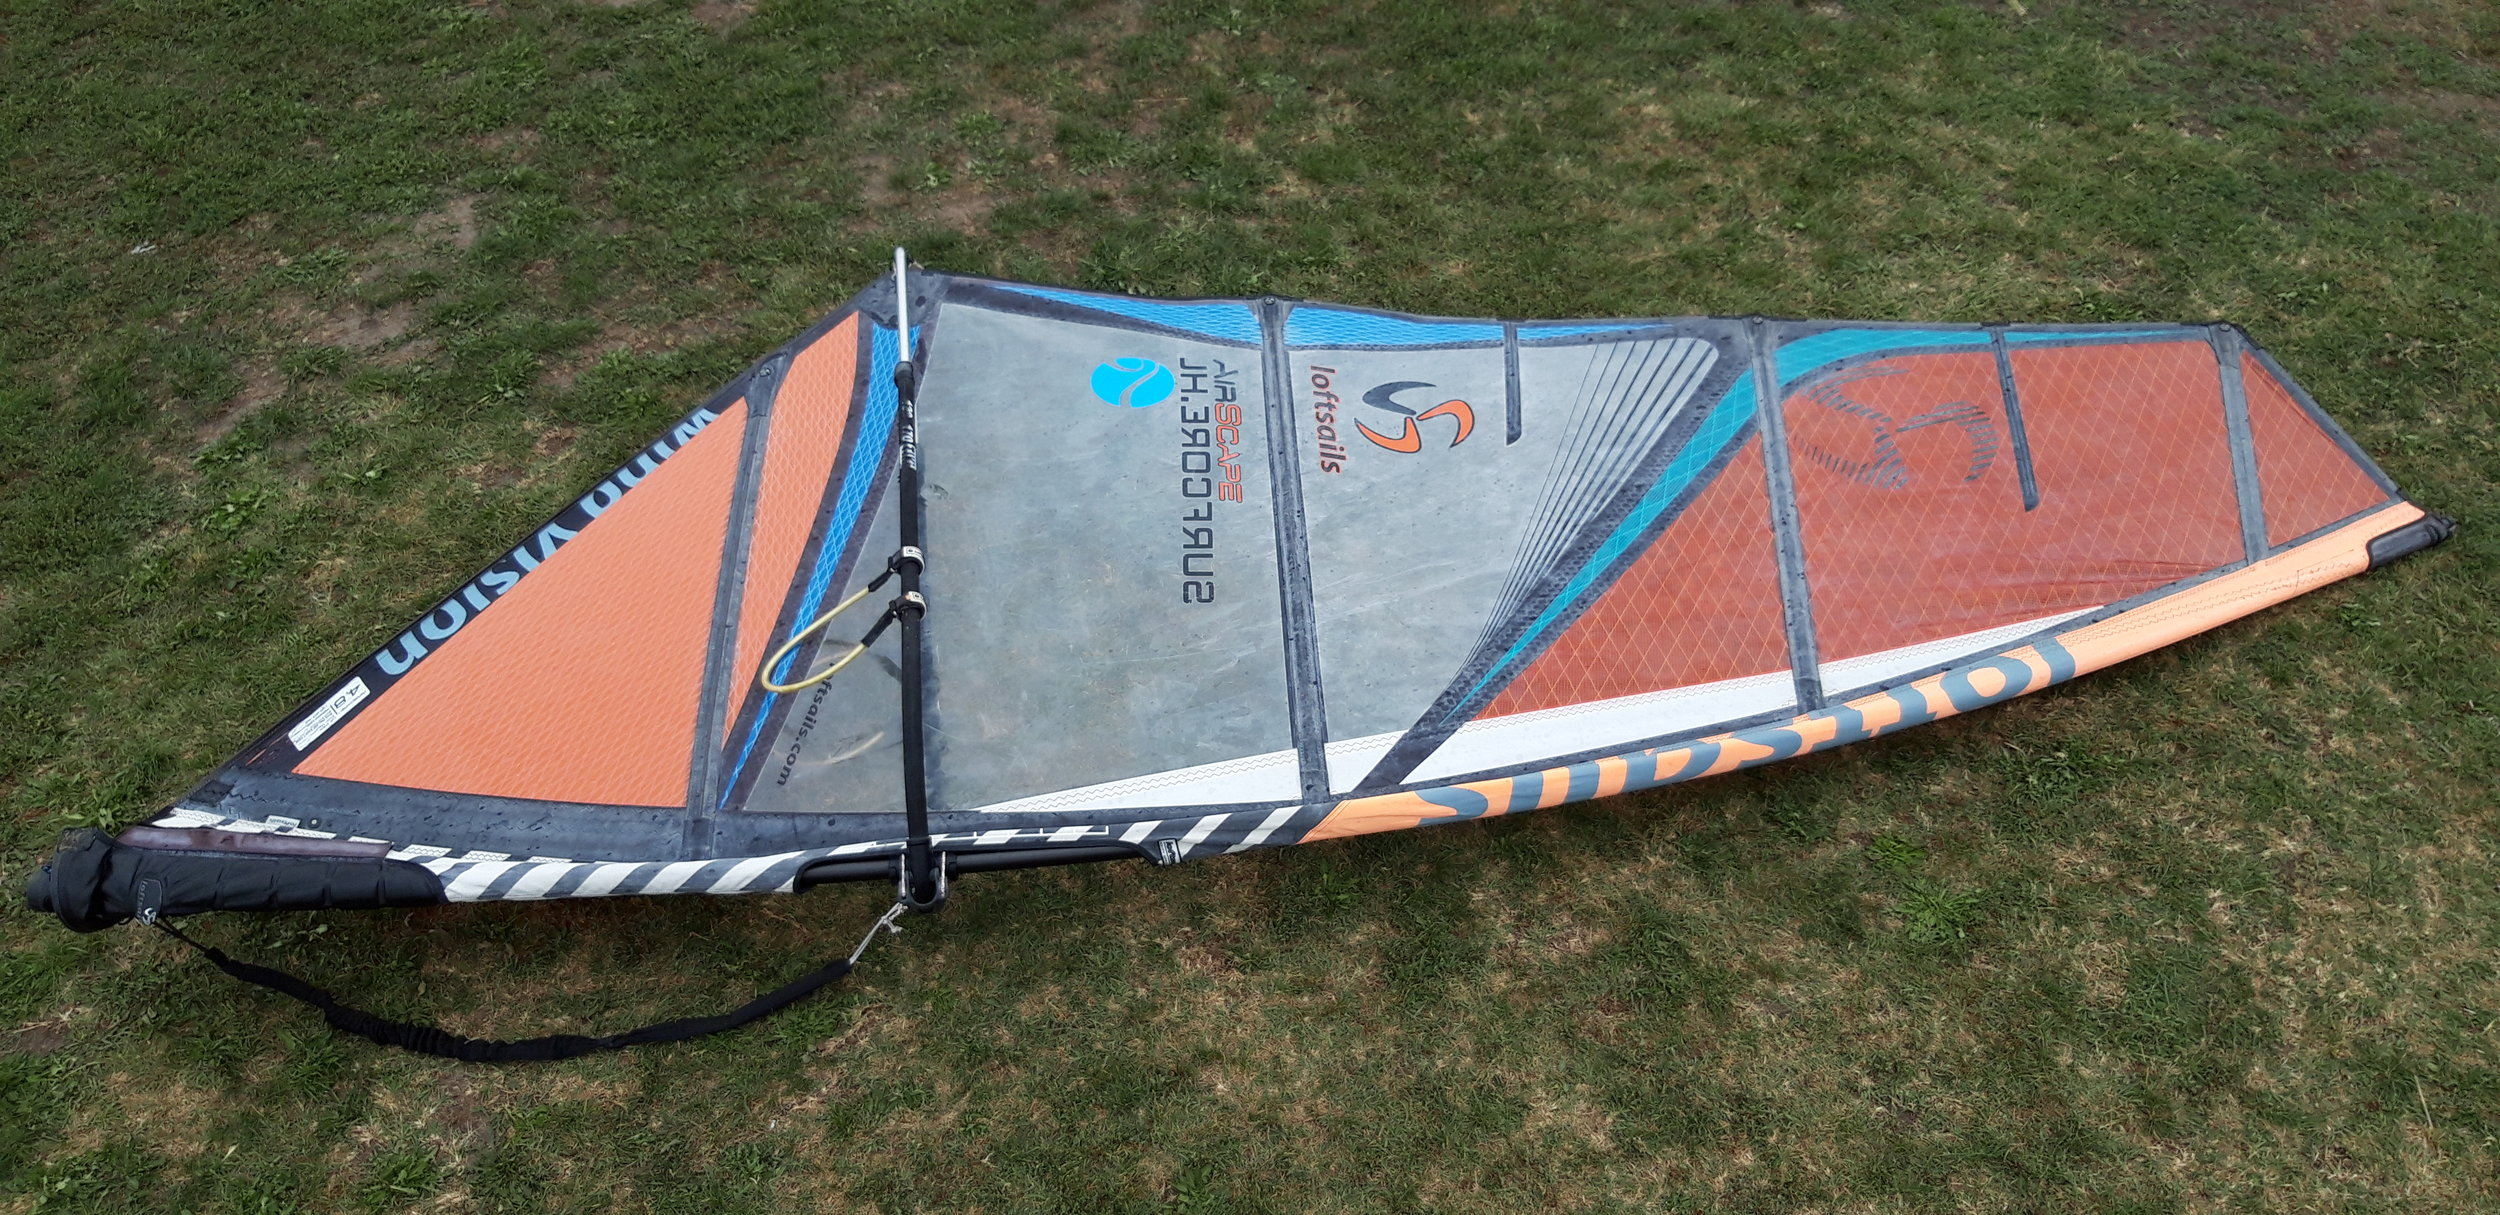 Loftsails airscape 4.8